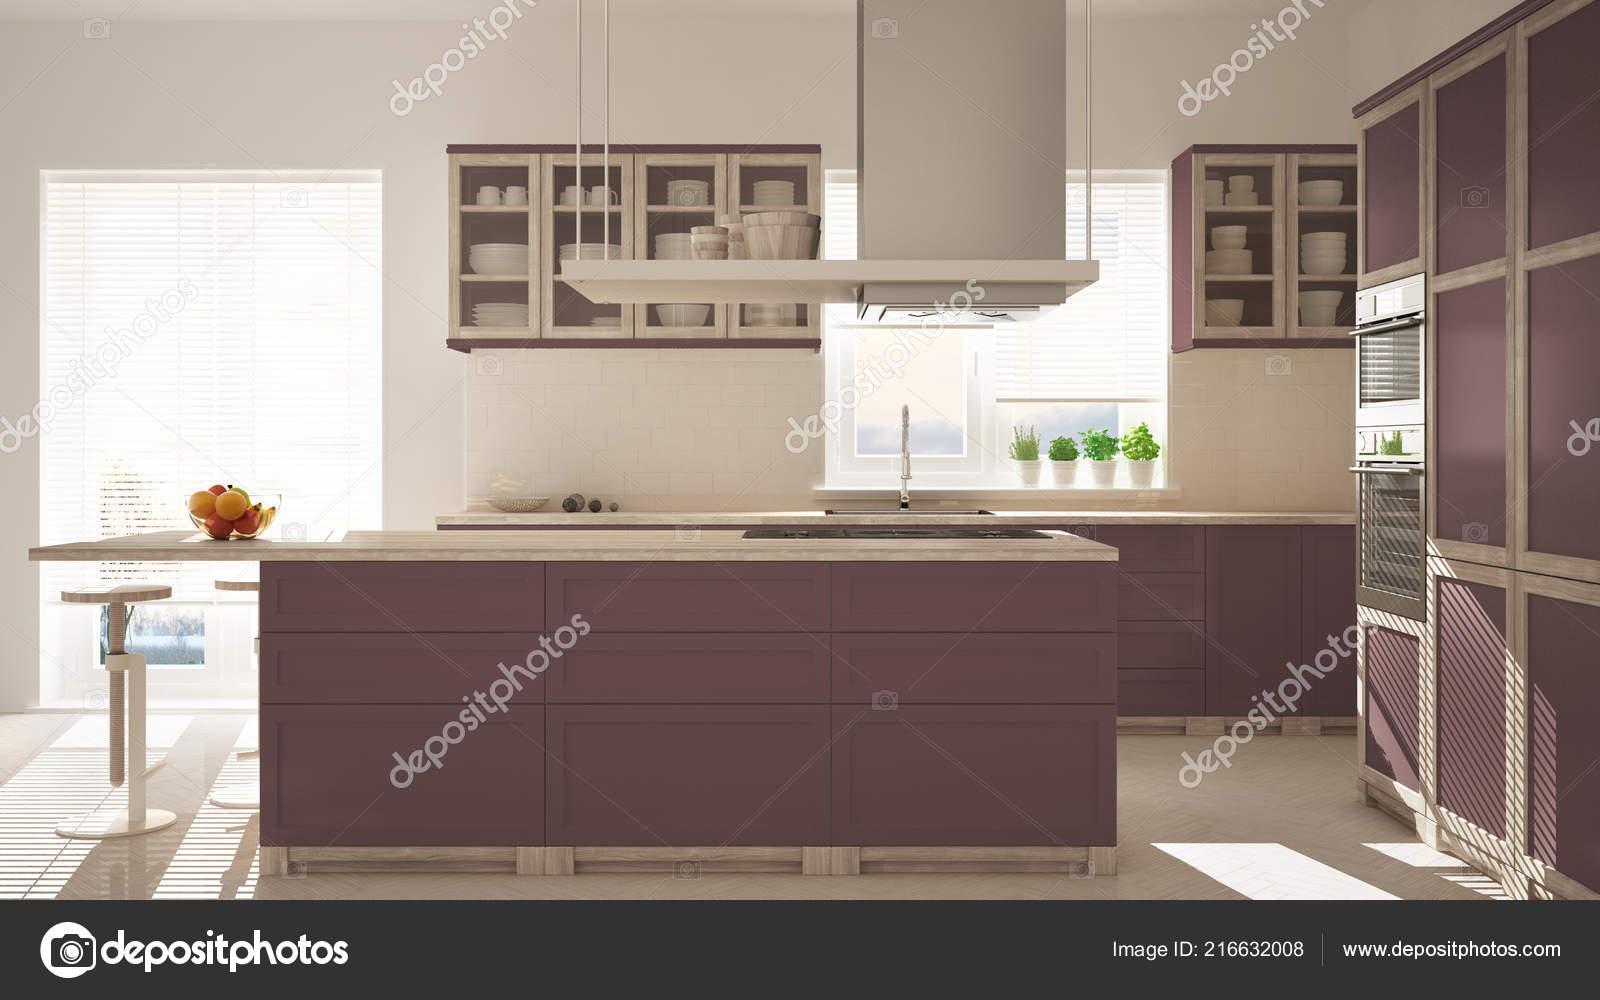 kitchen stool clocks for sale 现代木红色紫色厨房凳子和窗户镶木人字地板建筑简约的室内设计 图库照片 现代木红色紫色厨房凳子和窗户镶木人字地板建筑简约的